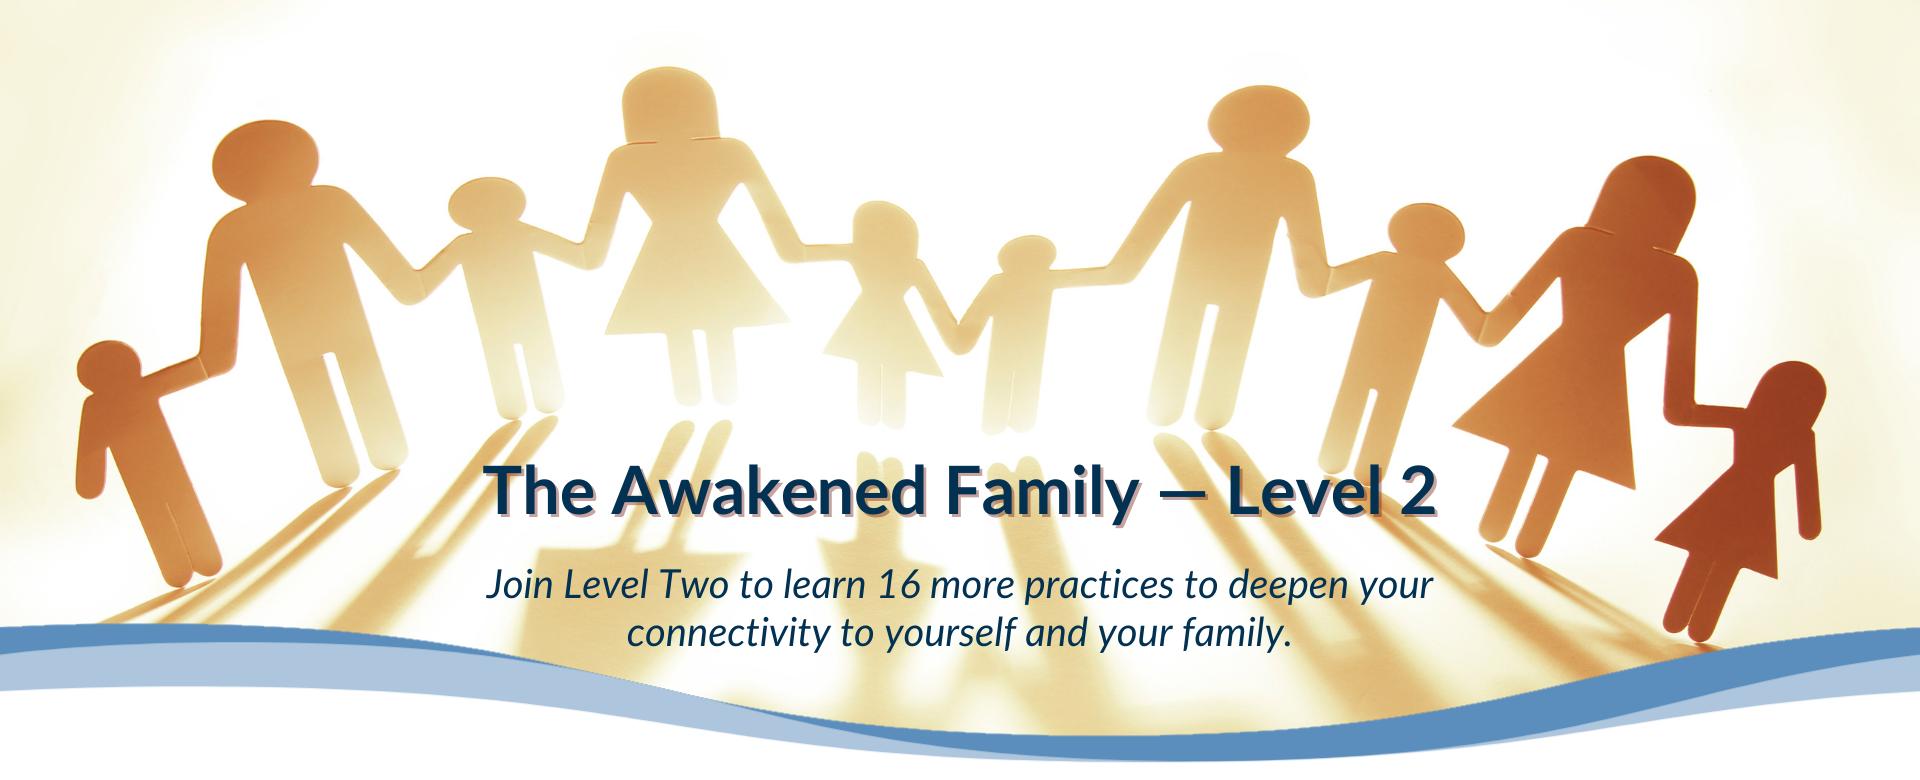 The Awakened Family Level 2